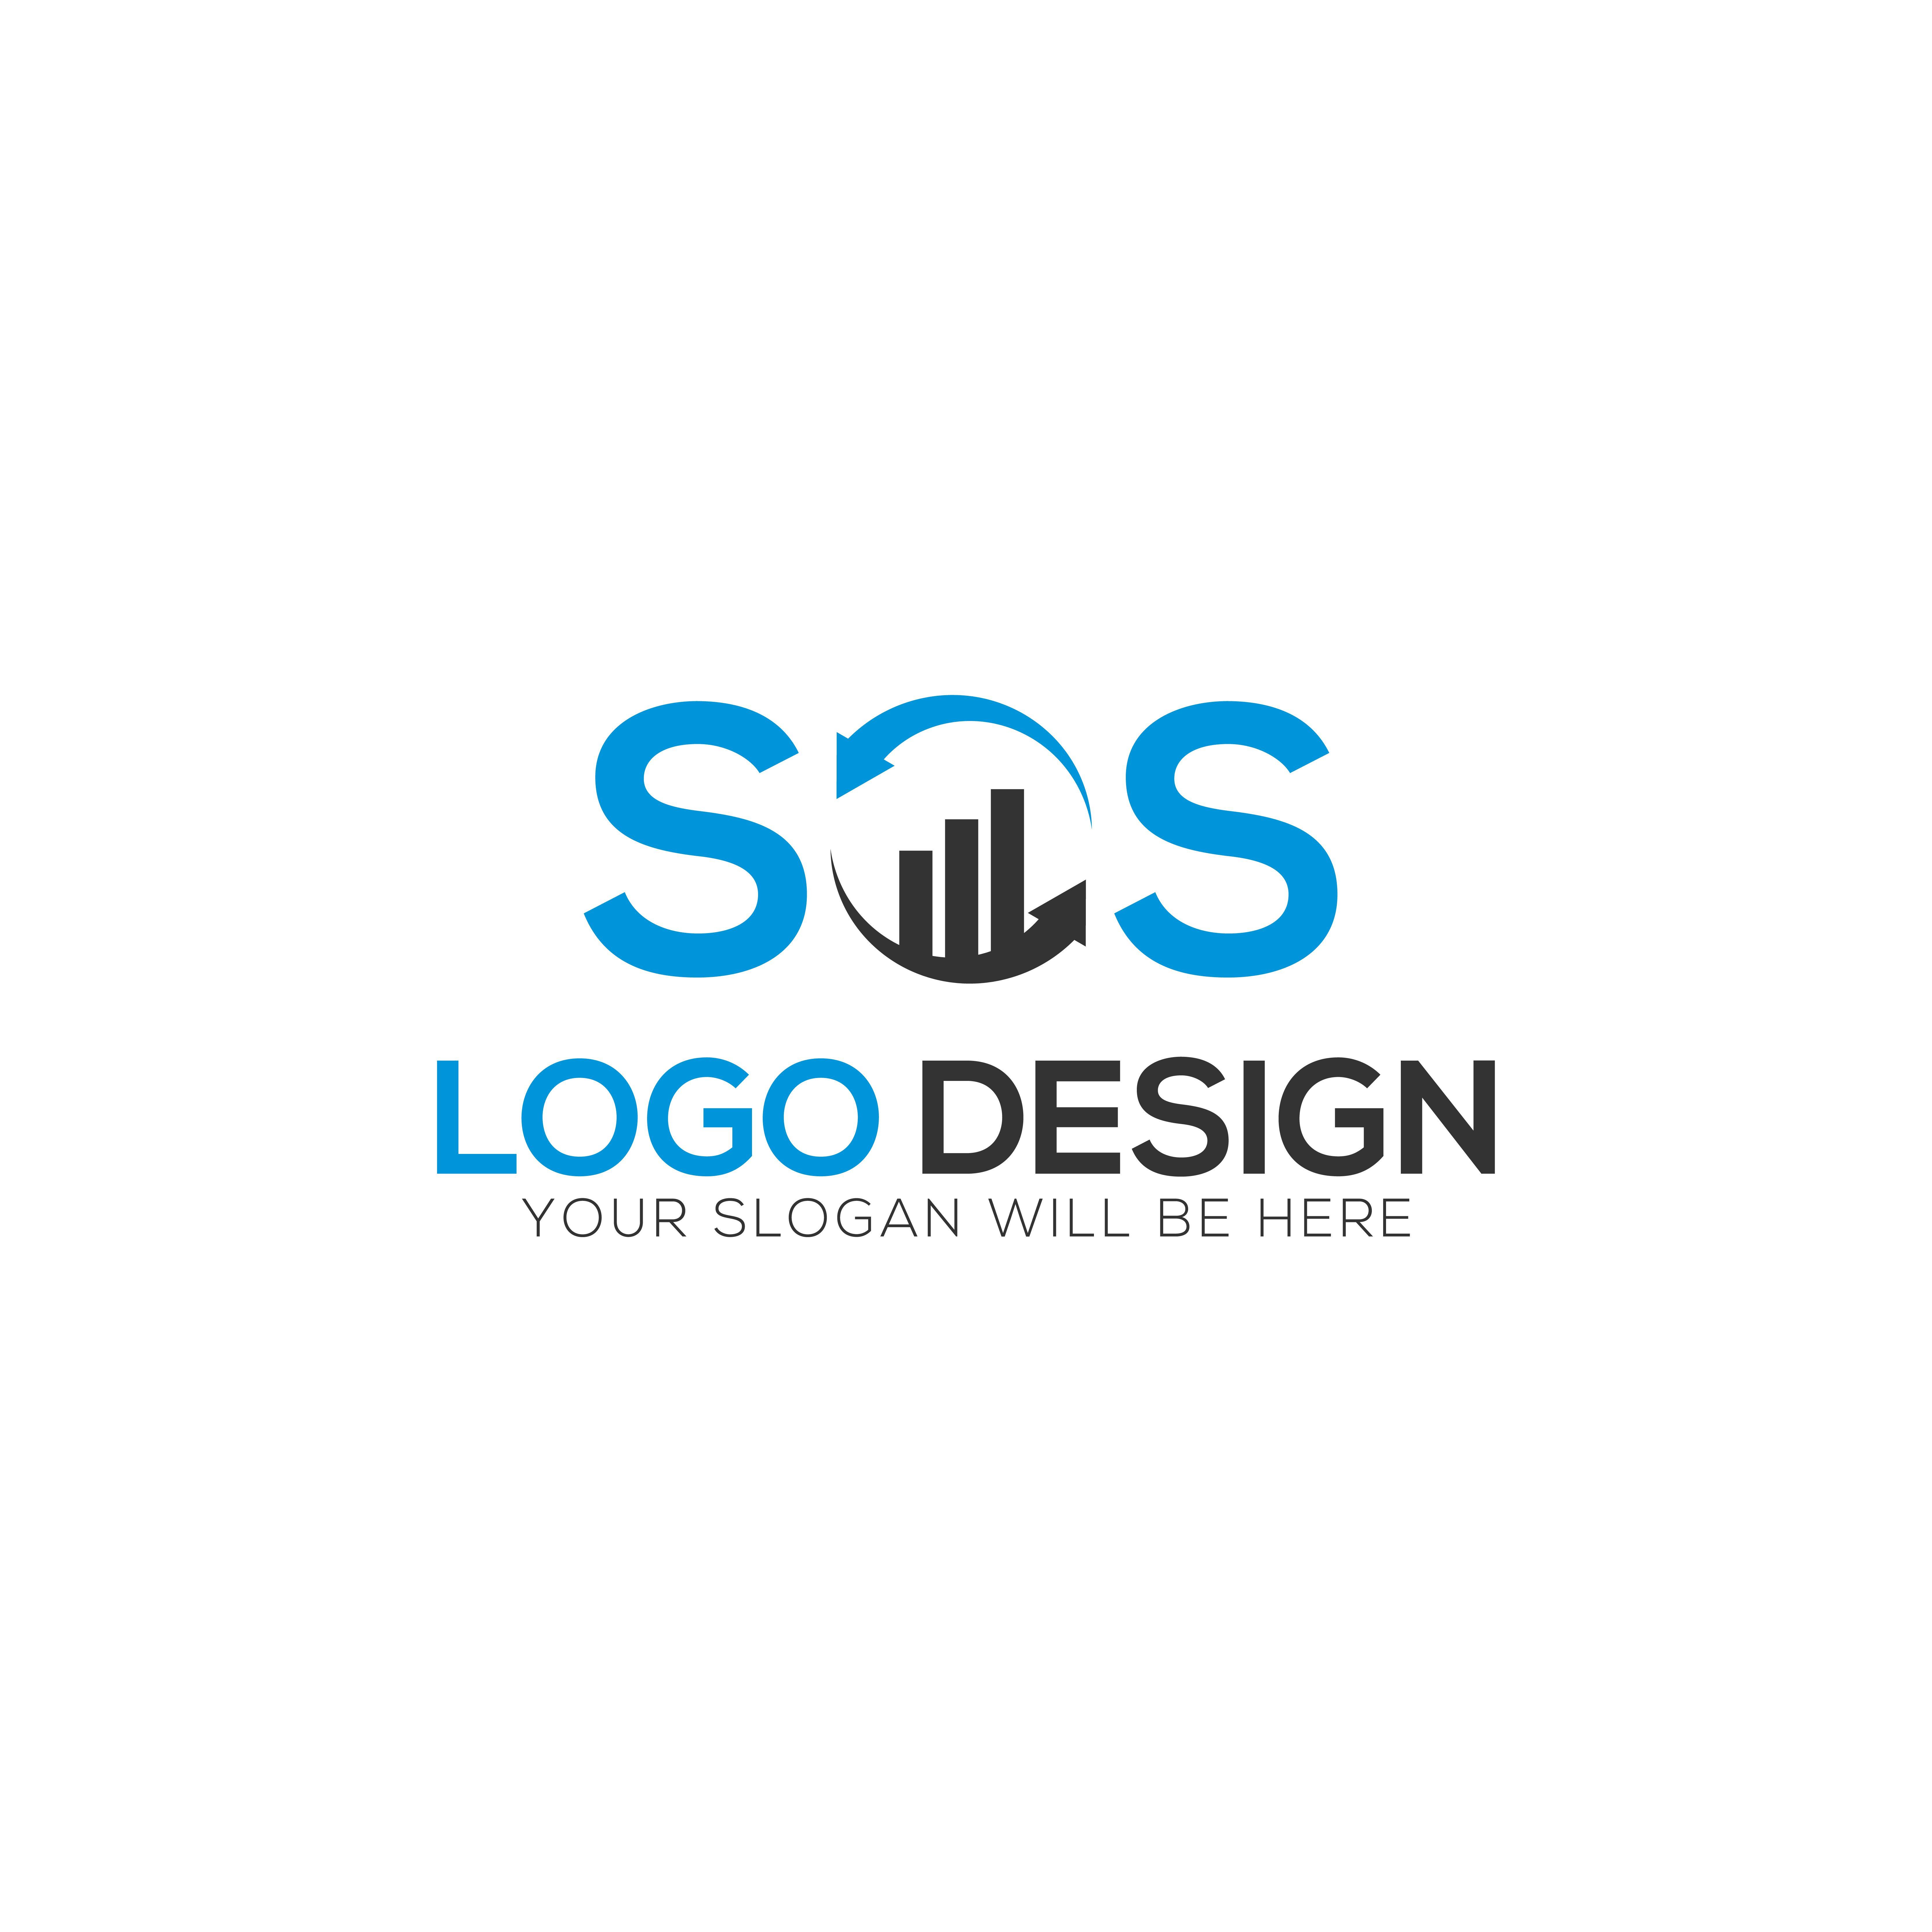 SOS Letter Logo Design Vector illustration logo_design,